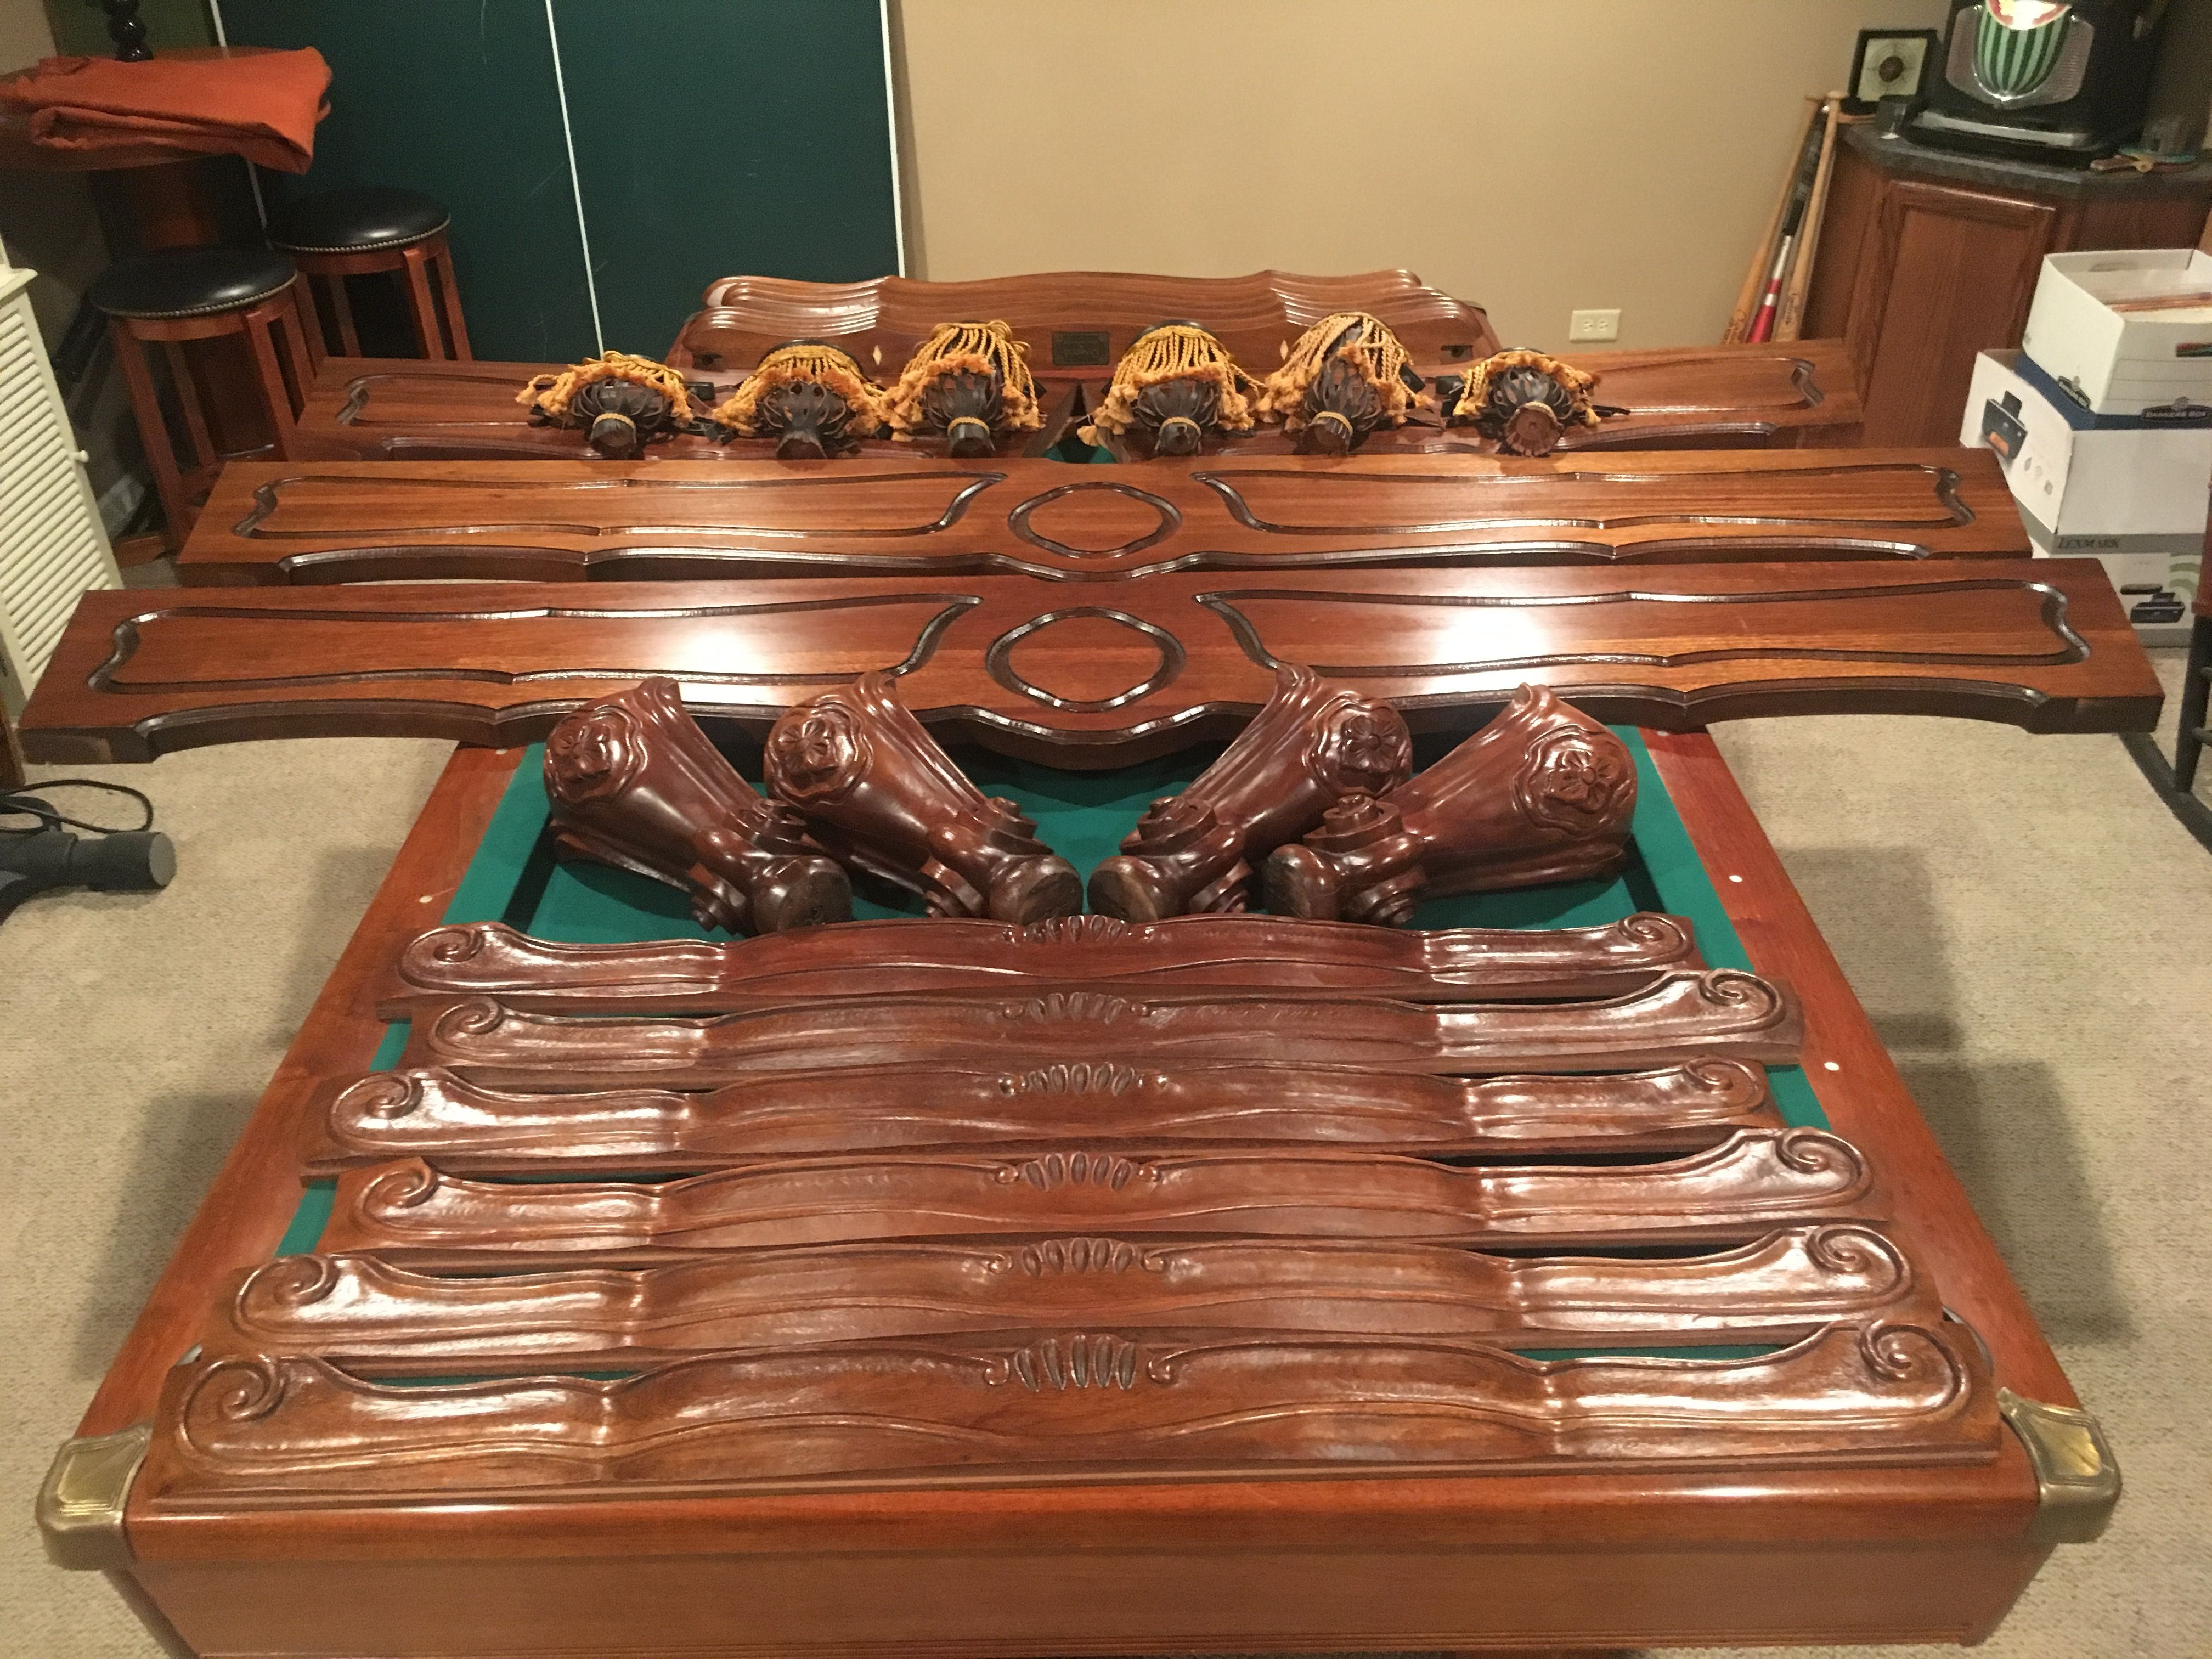 9' Brunswick Billiards Orleans Pool Table Very Clean